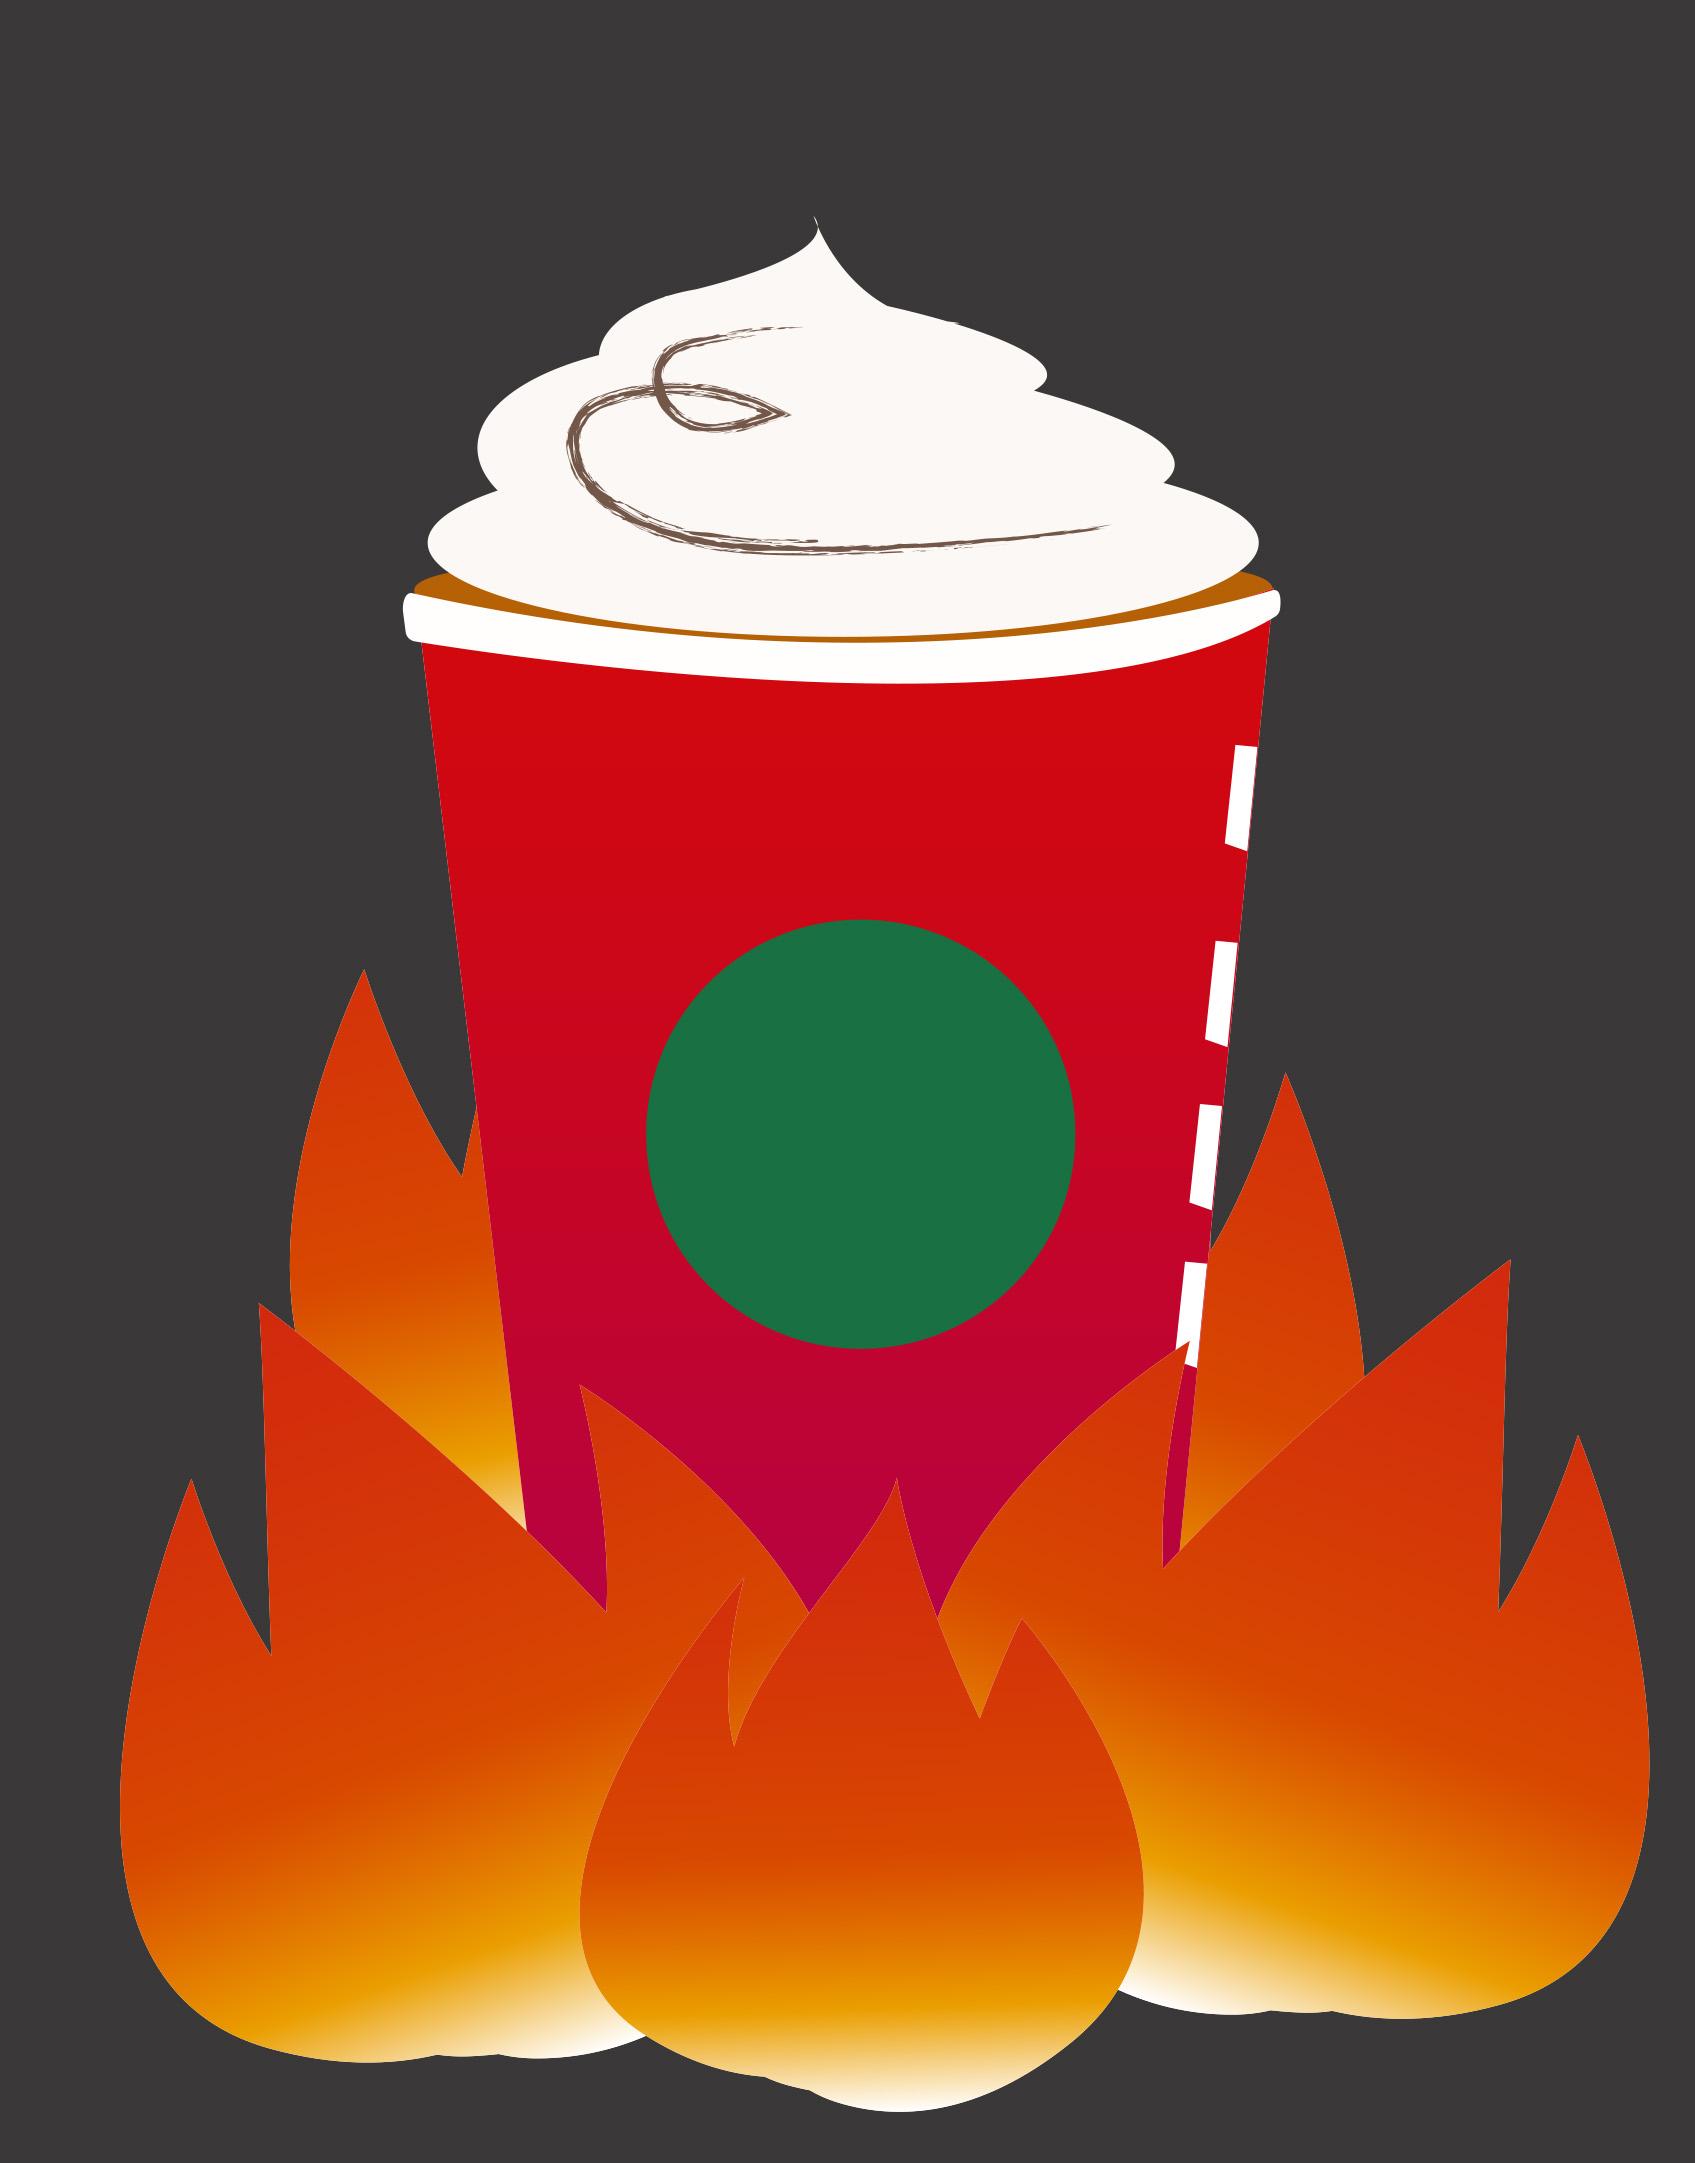 redcuponfire.jpg